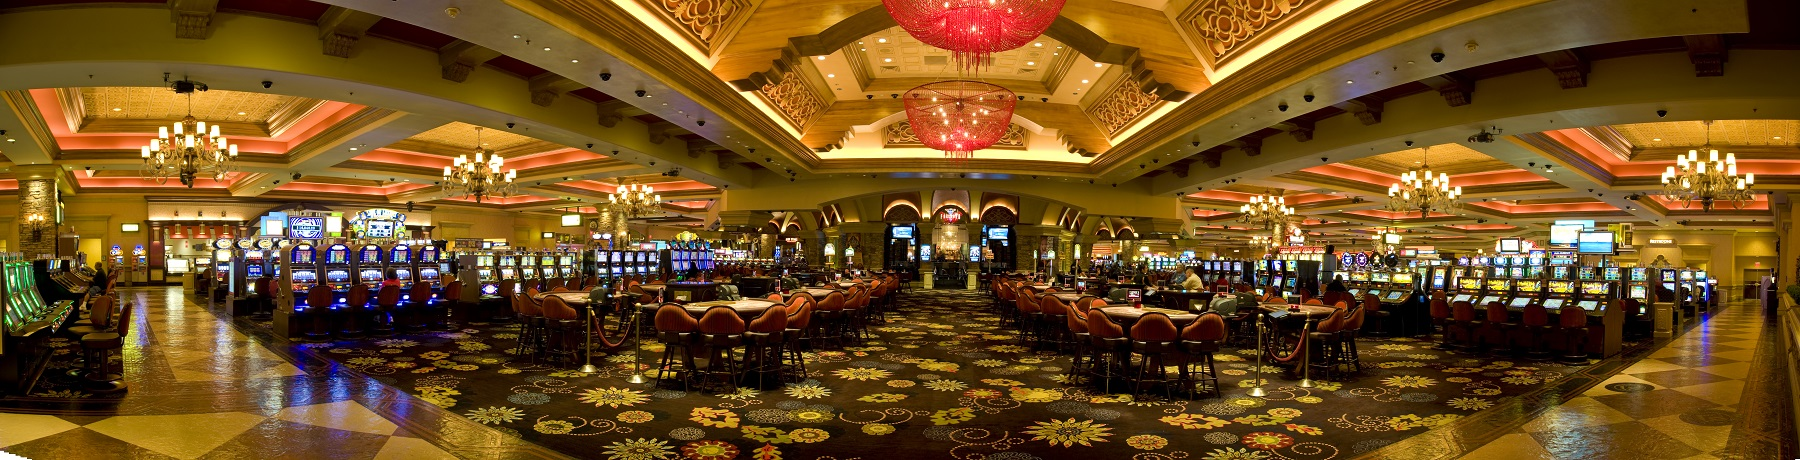 Thunder valley casino smoke free roseville ca casino